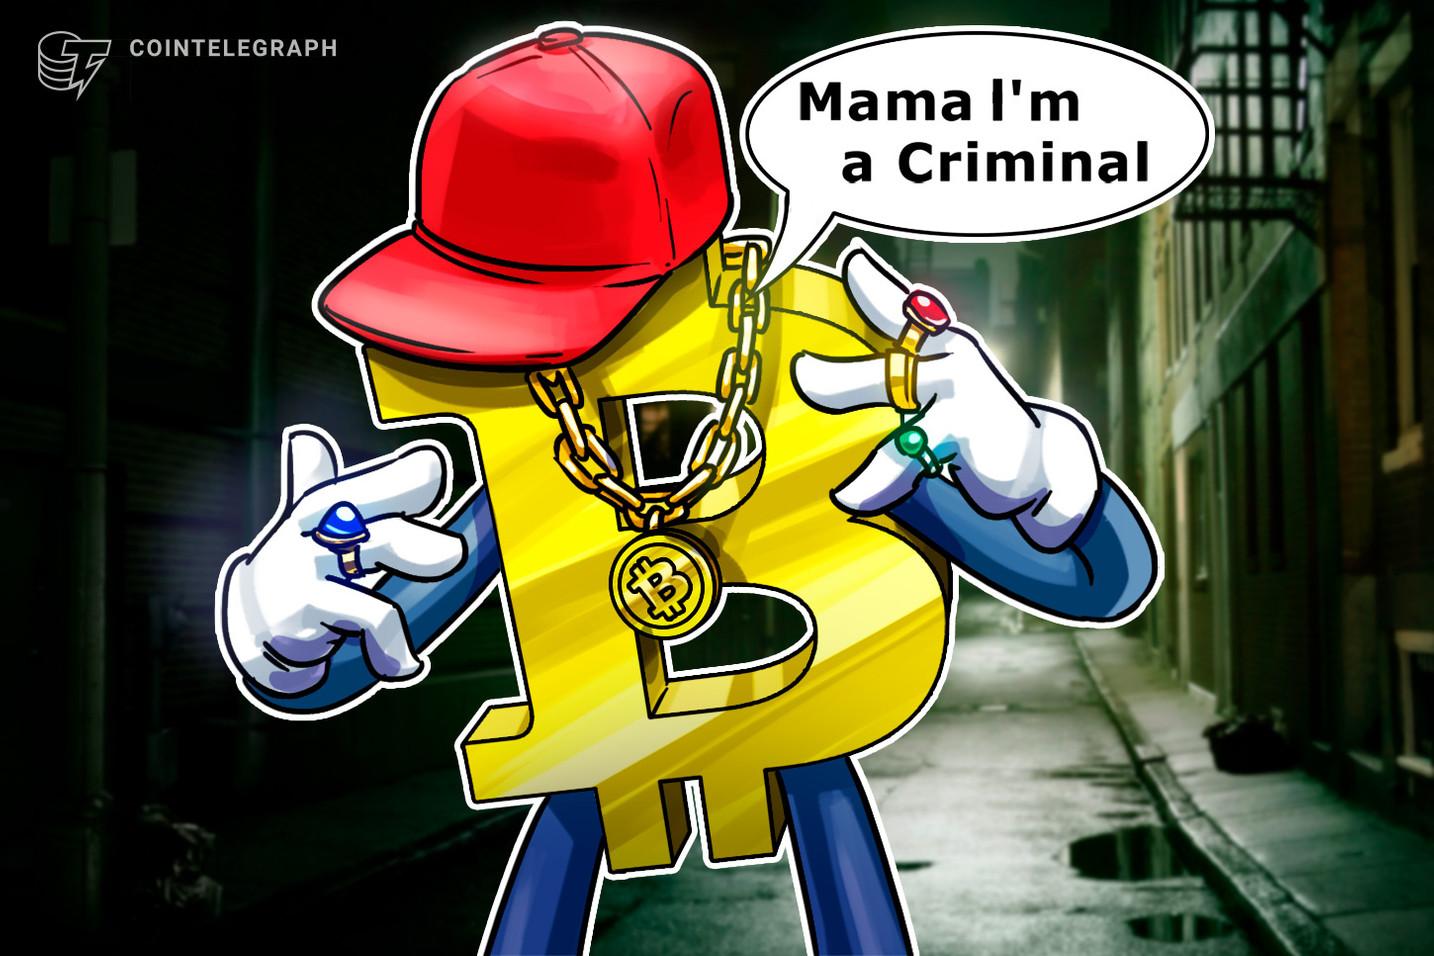 At Least 95 Percent of Crypto Crimes Involve Bitcoin, Chainalysis Executive Says